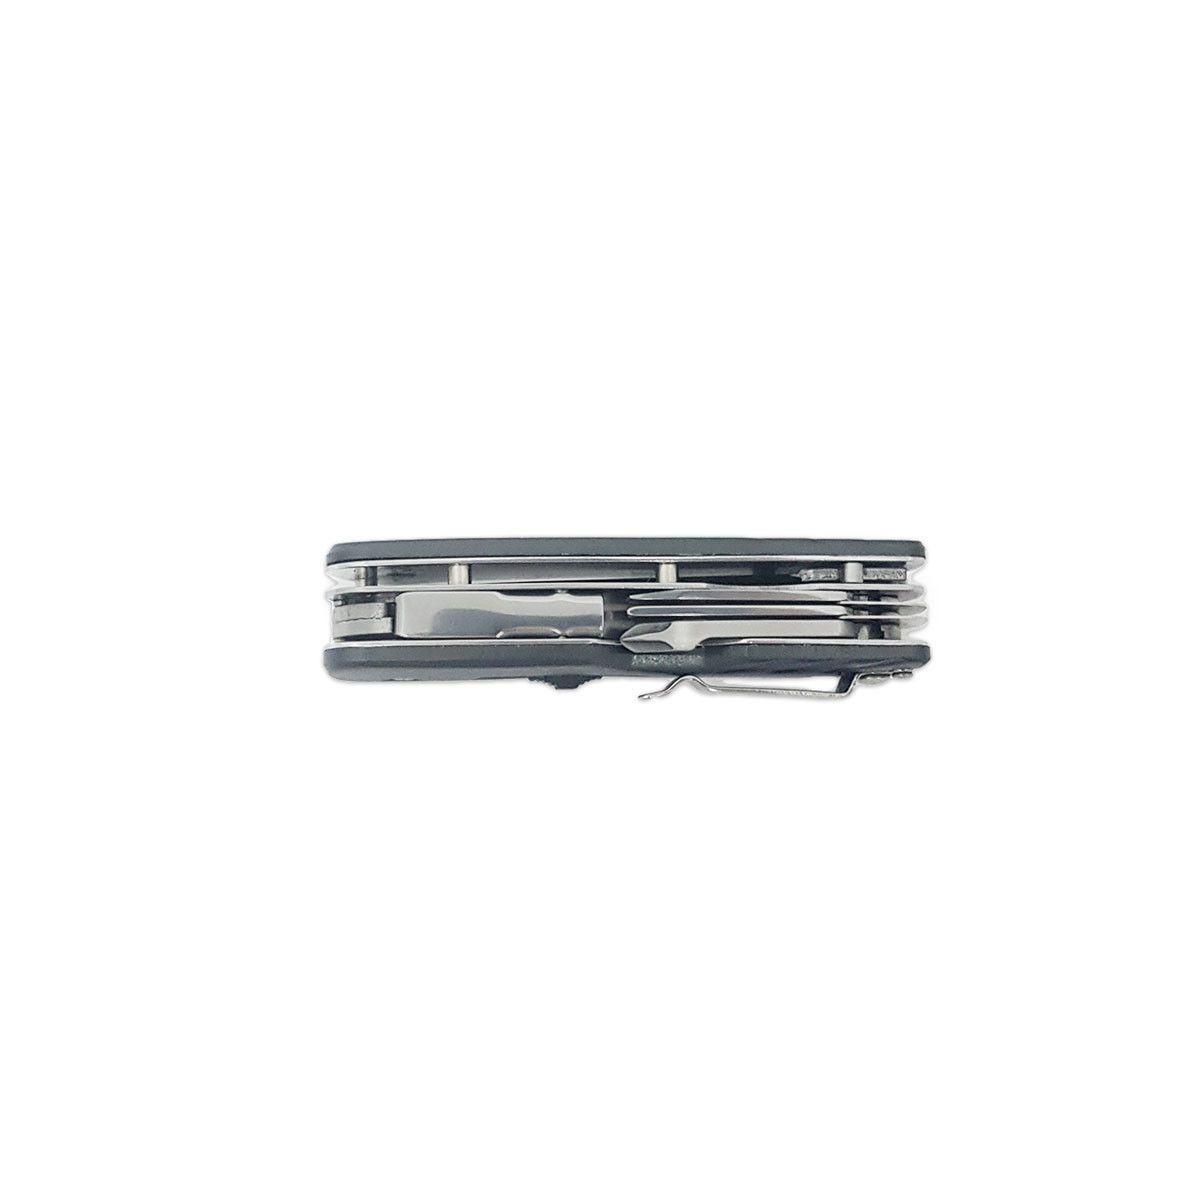 Multi Ferramenta 7 em 1 Cimo Fly Tool Aço Inox 420 Garantia Ilimitada